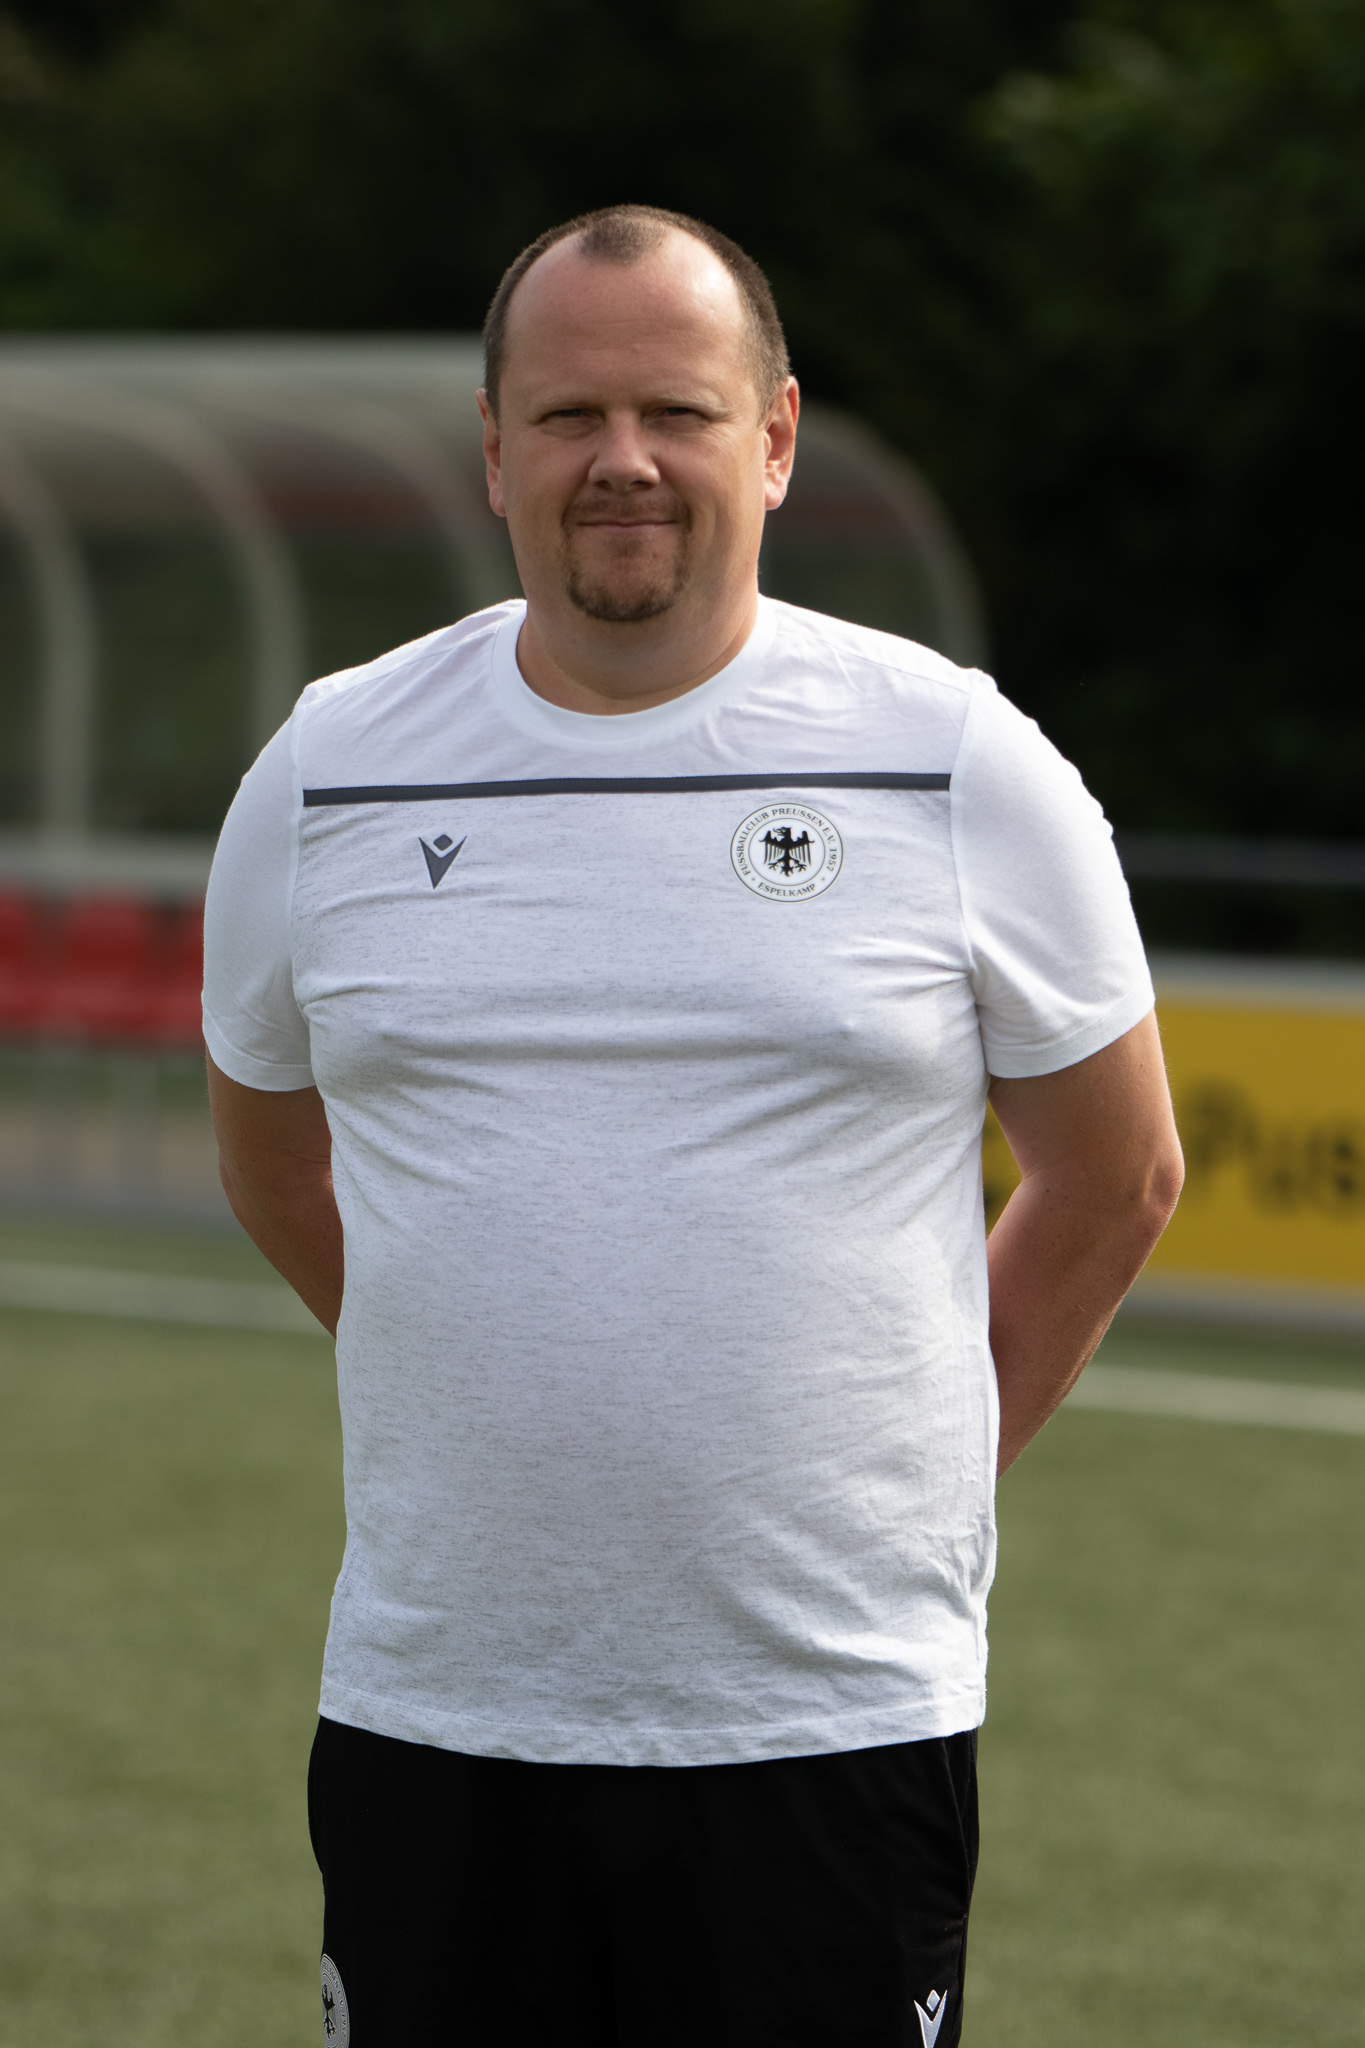 Andreas Dyck